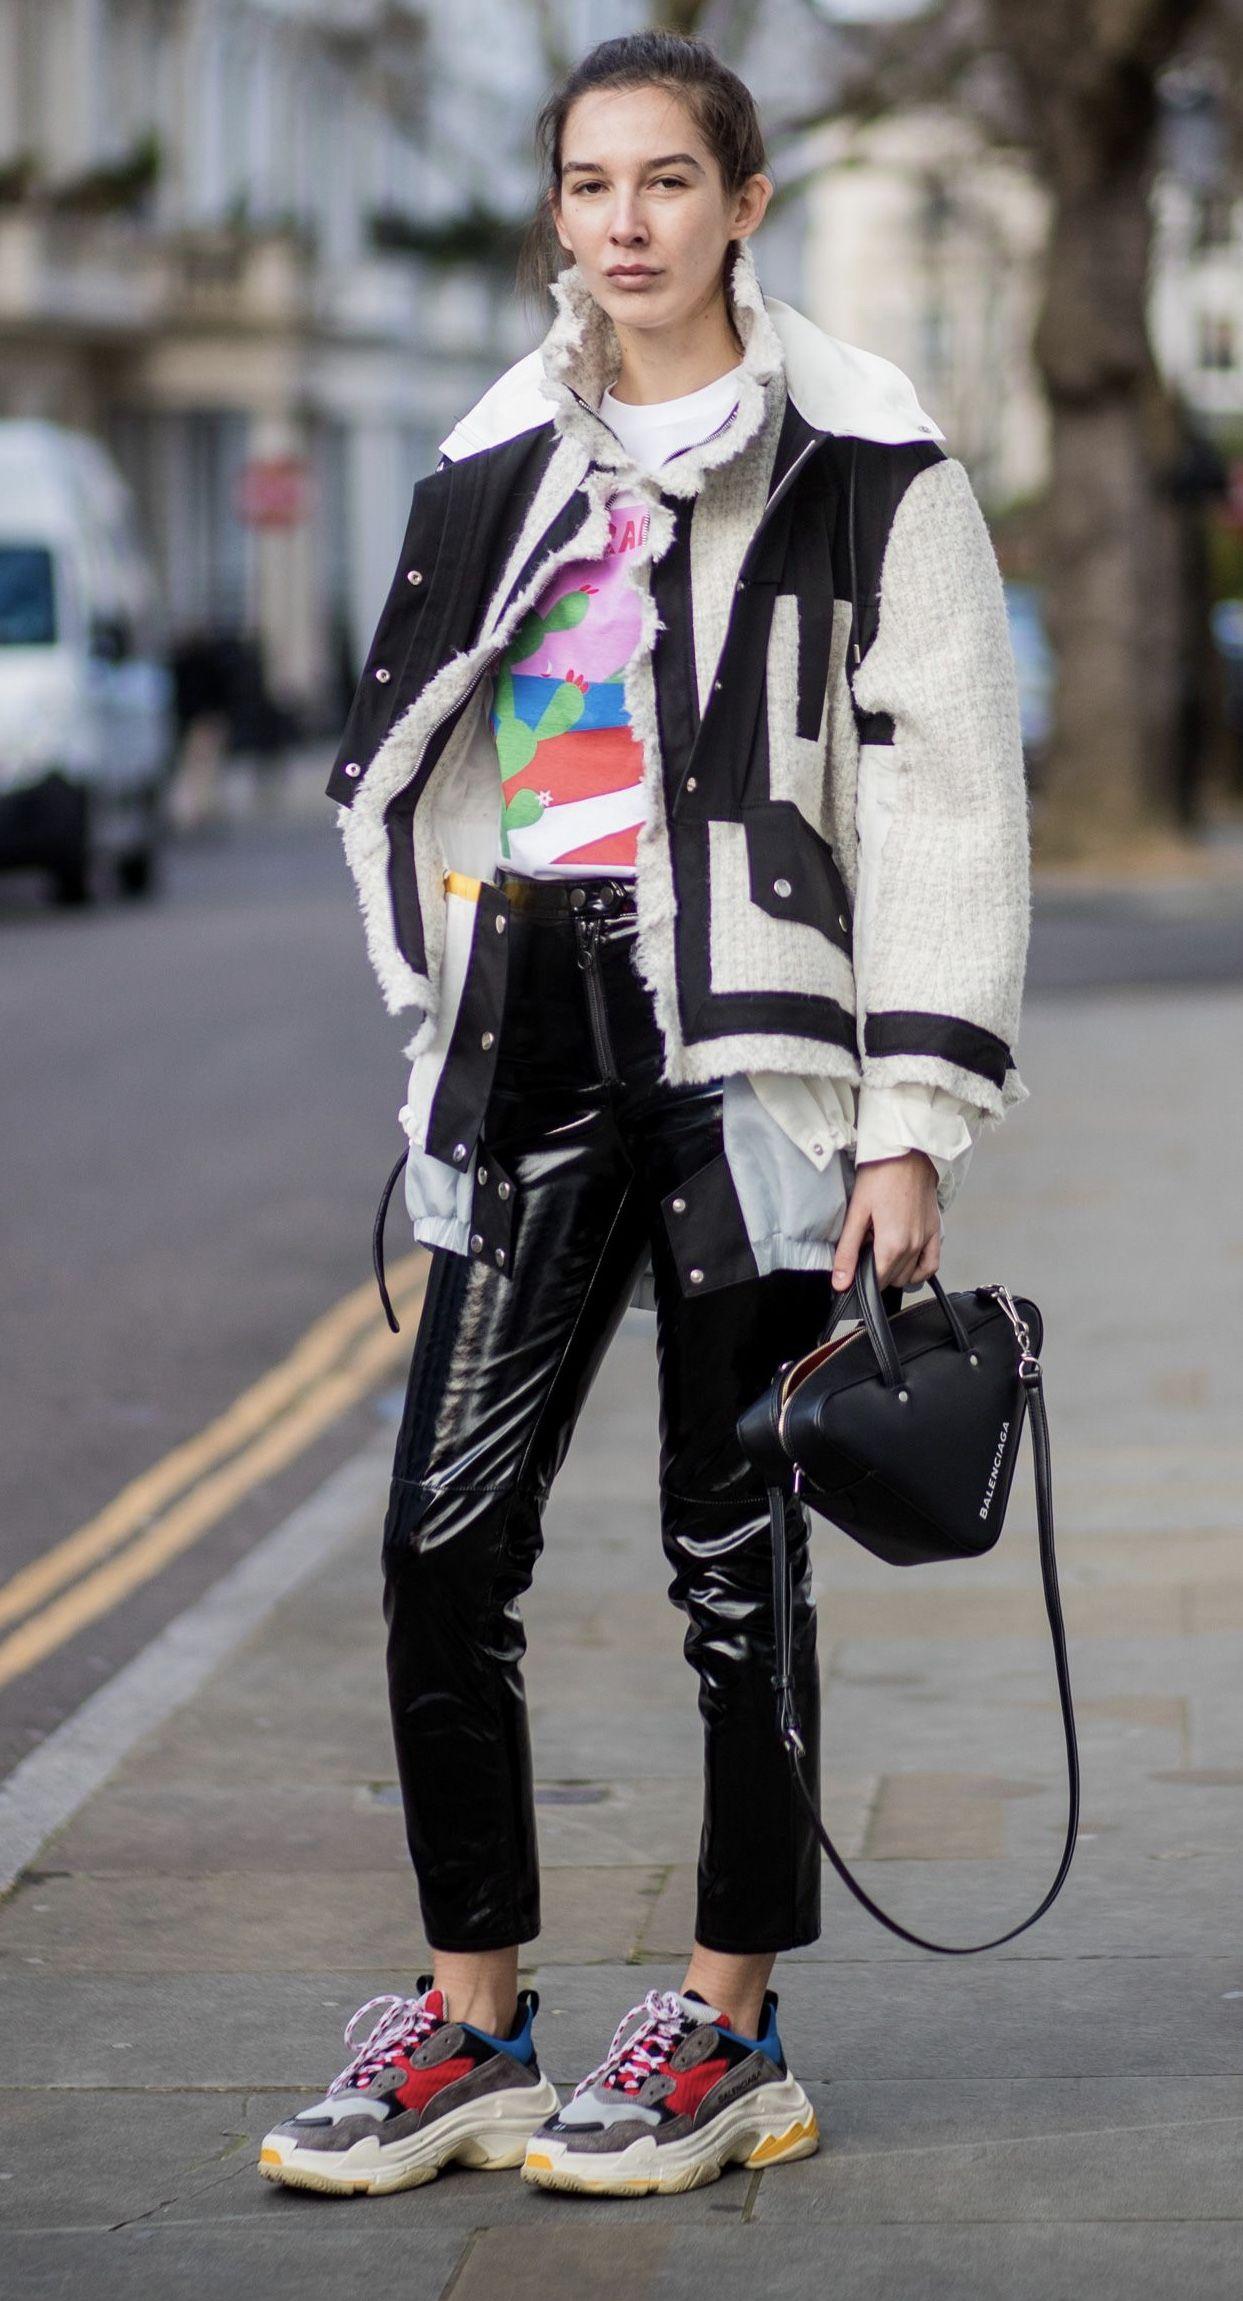 Balenciaga Handbag Triple S Trainers On Estelle Pigault